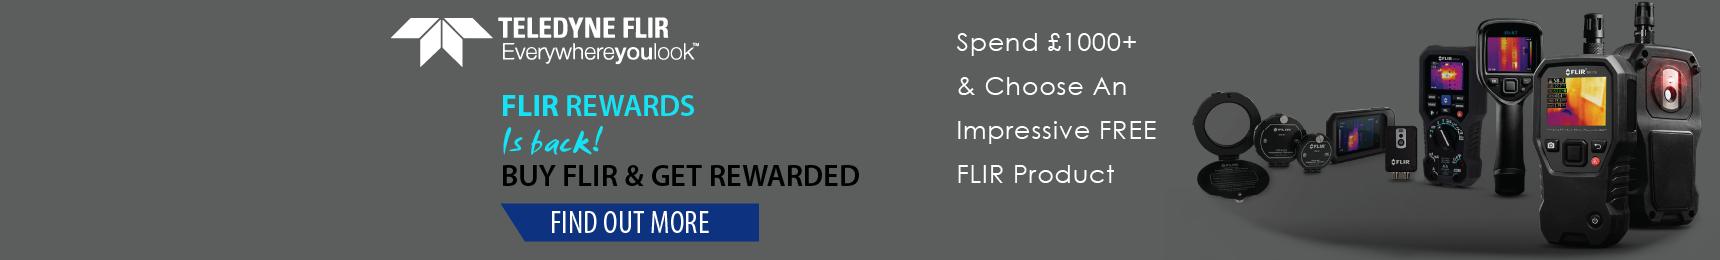 FLIR REWARDS Promotion on AcutestDirect